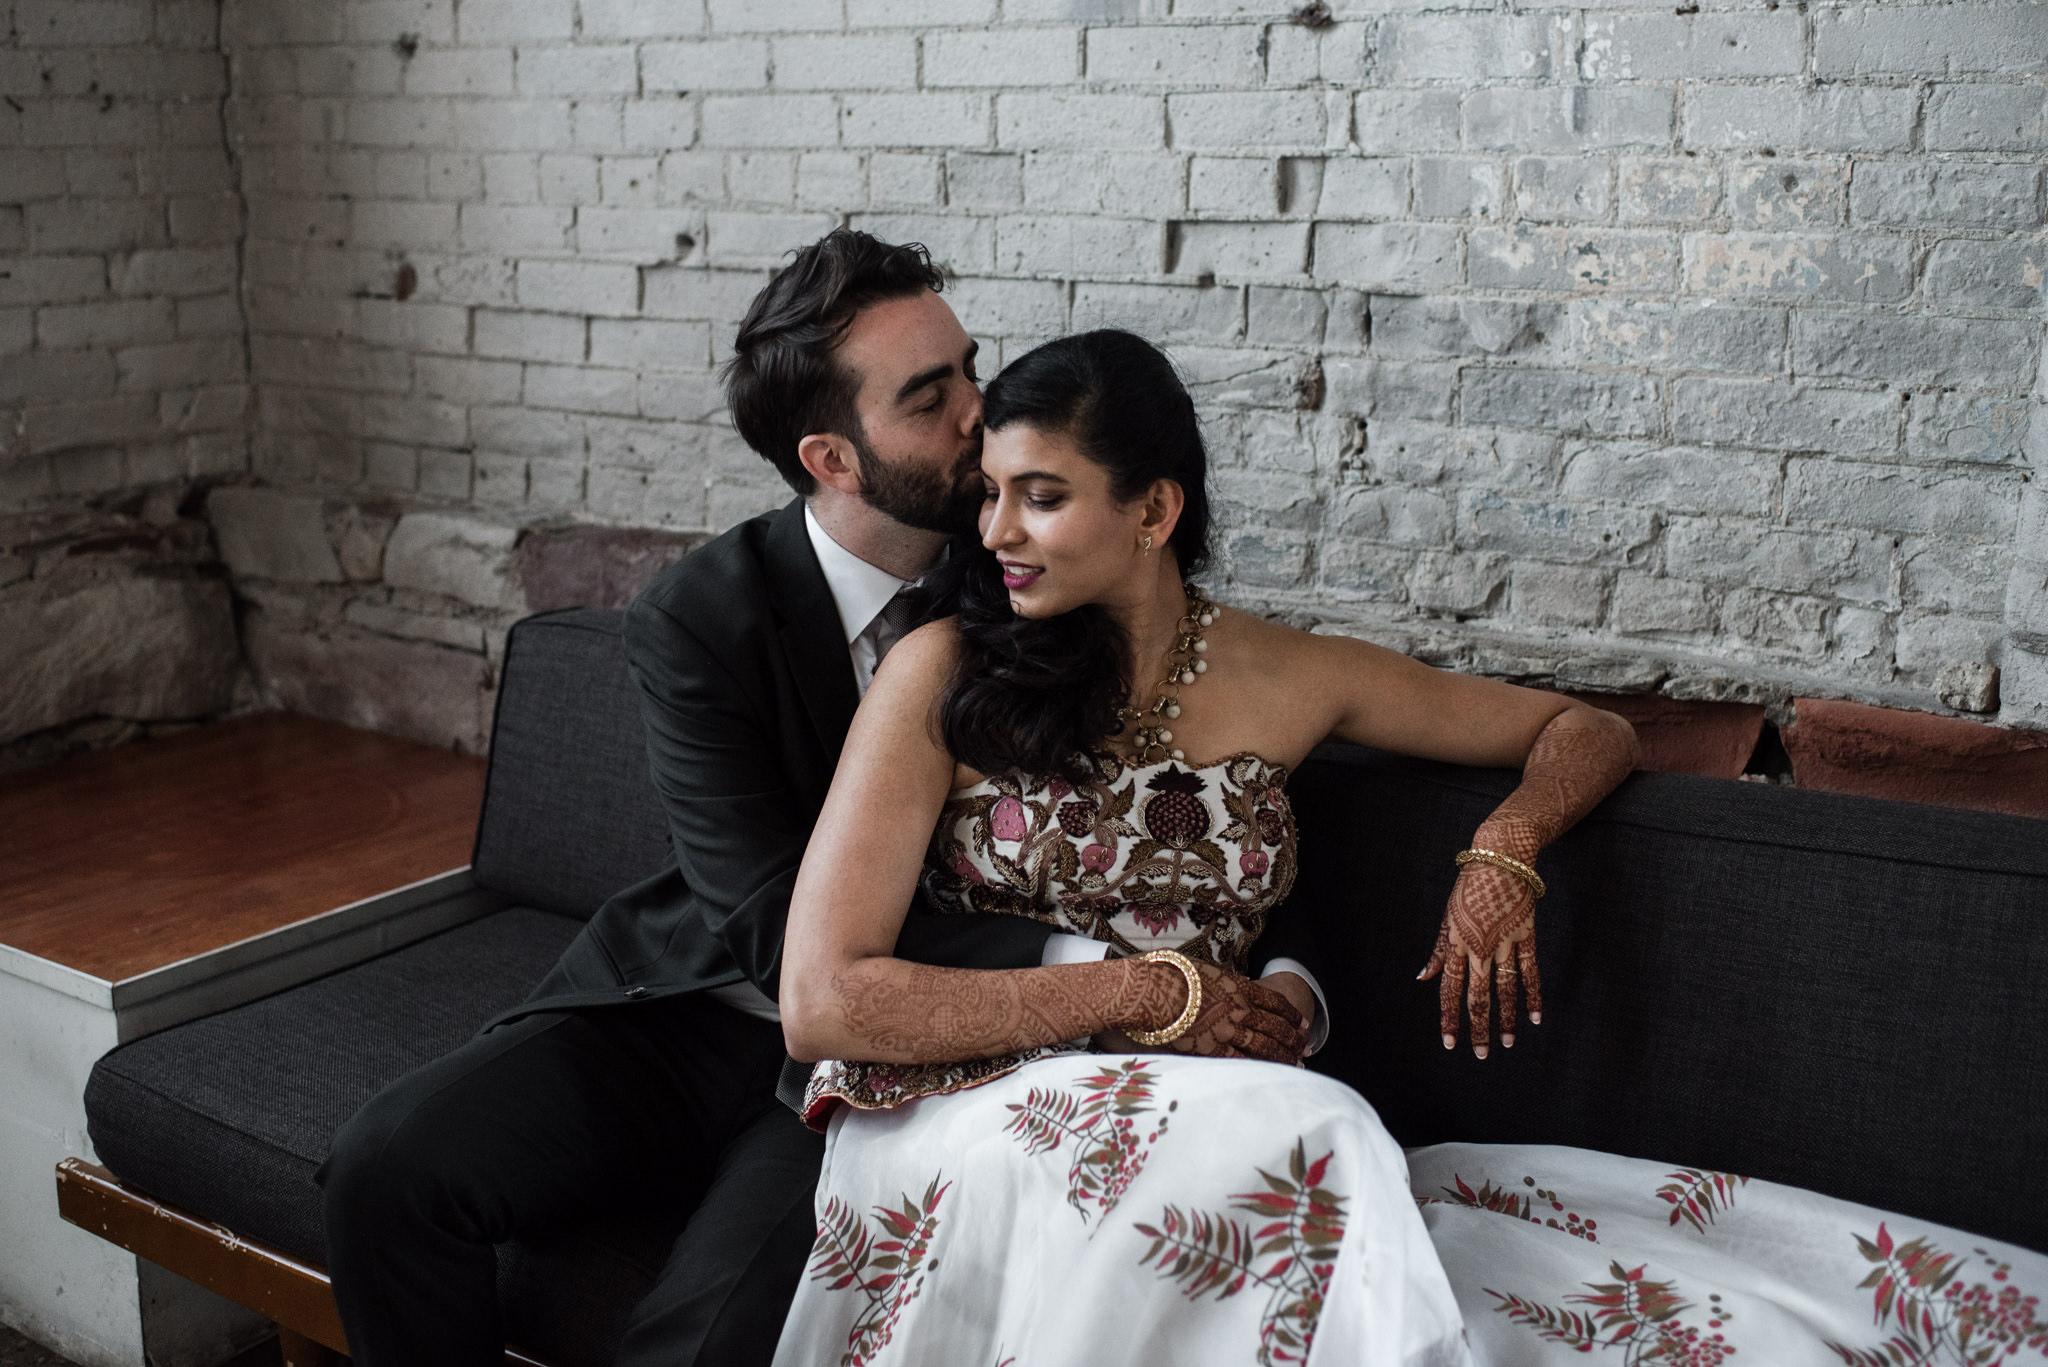 050-bride-groom-wedding-photos-hotel-ocho-toronto.jpg